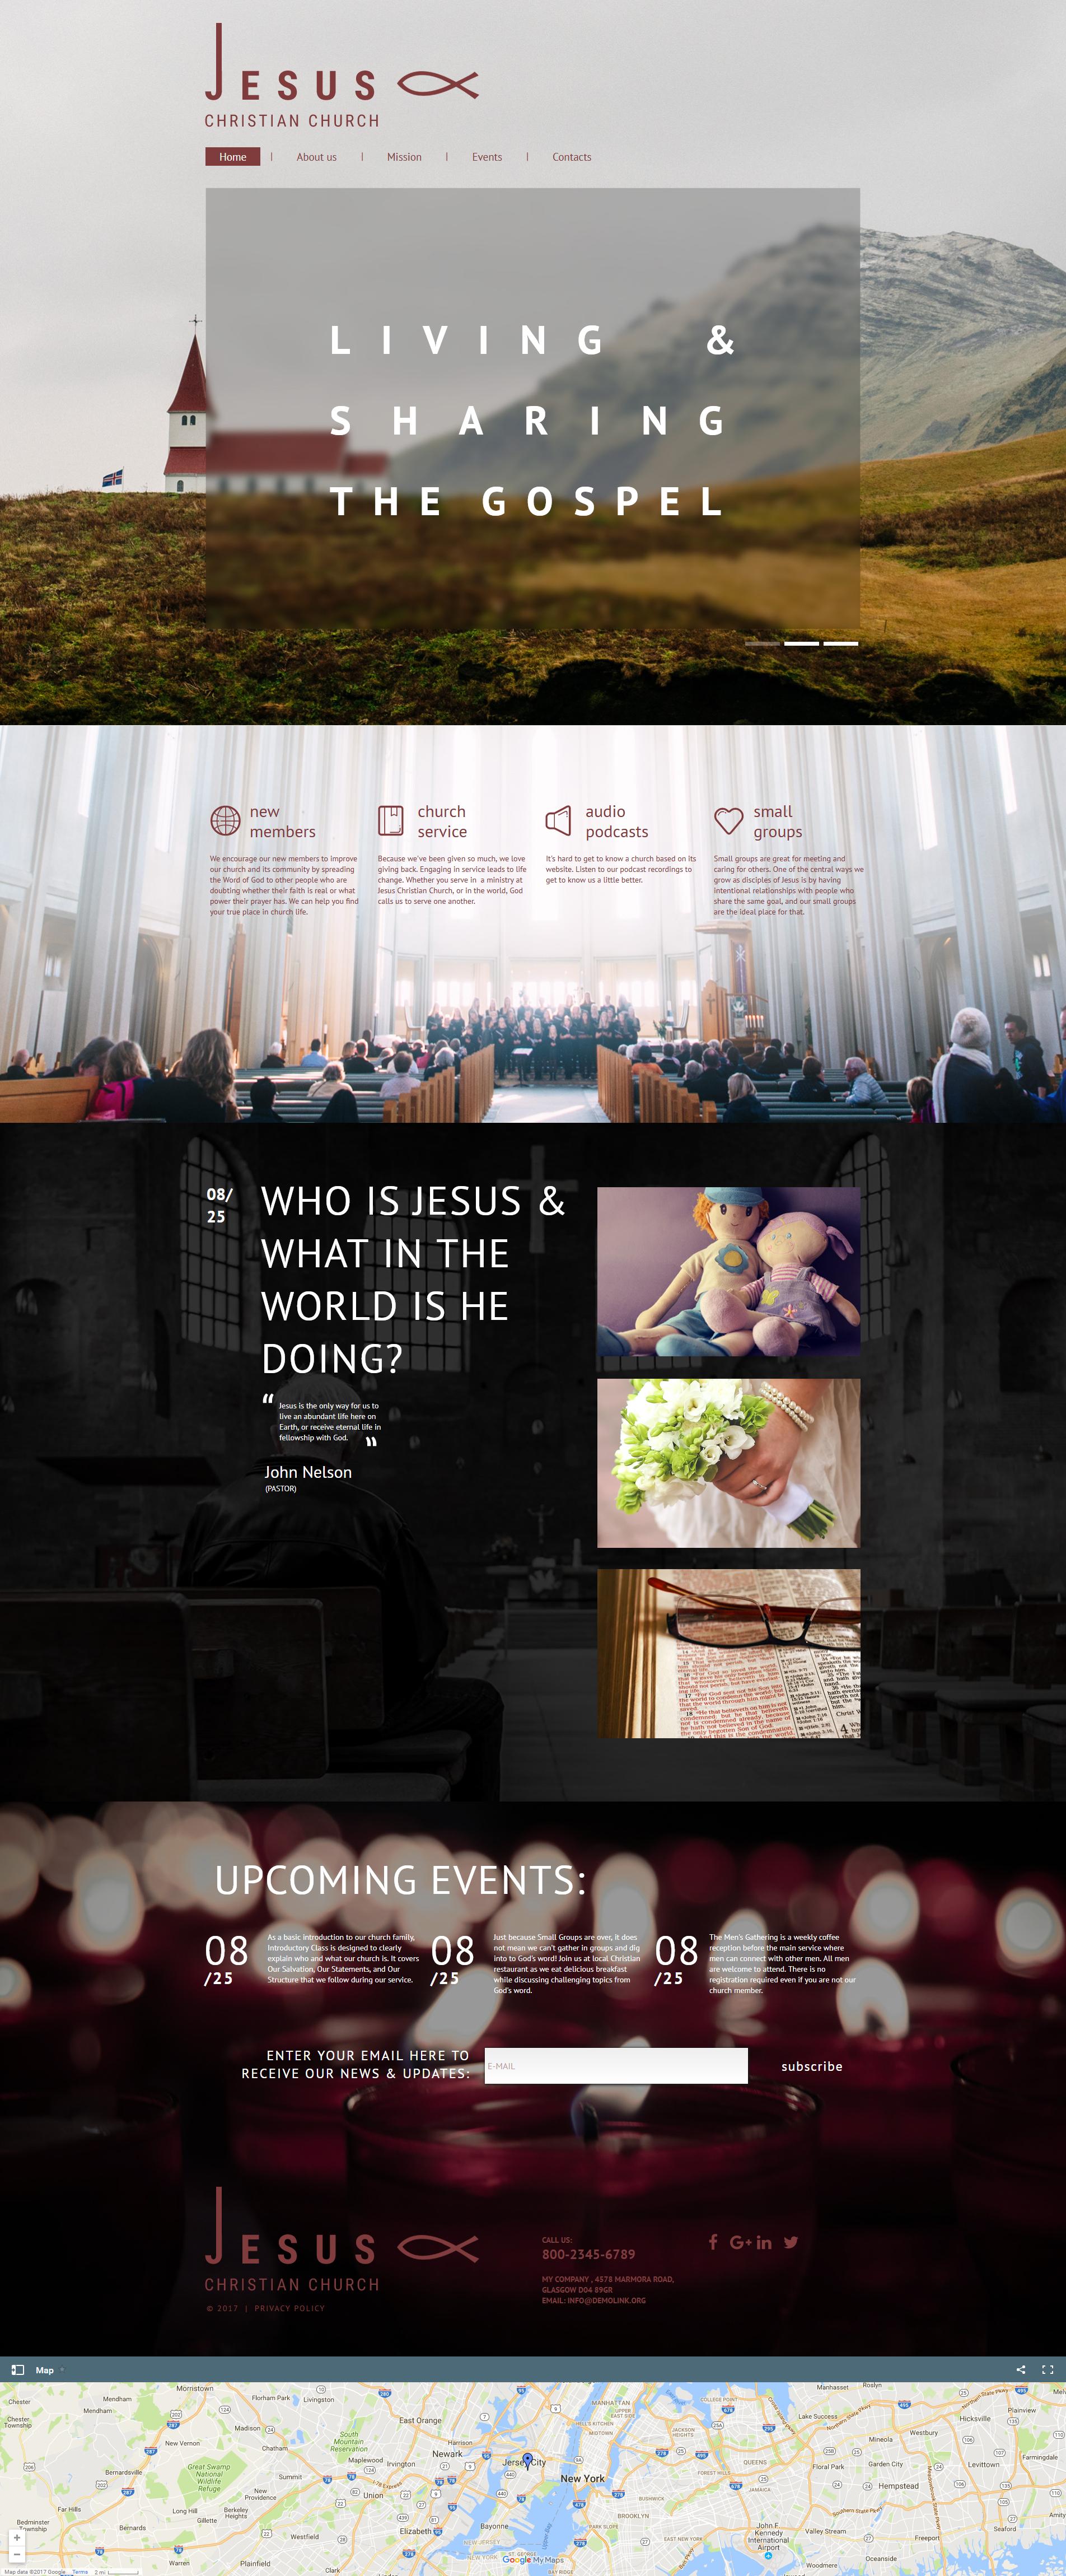 Jesus - Christian Church Moto CMS HTML Template